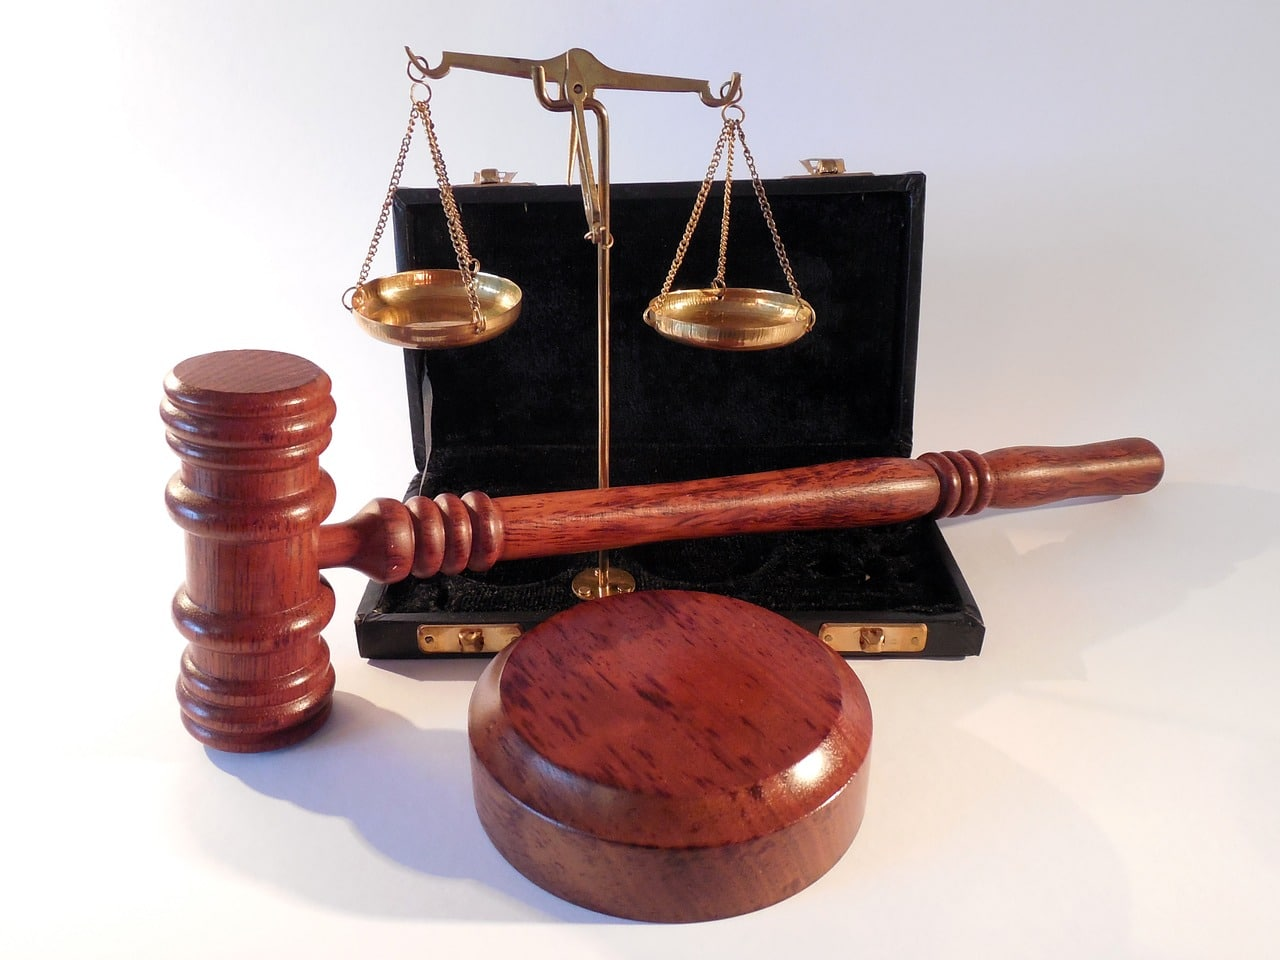 lie detector tests for legal aid claims, legal aid fraud